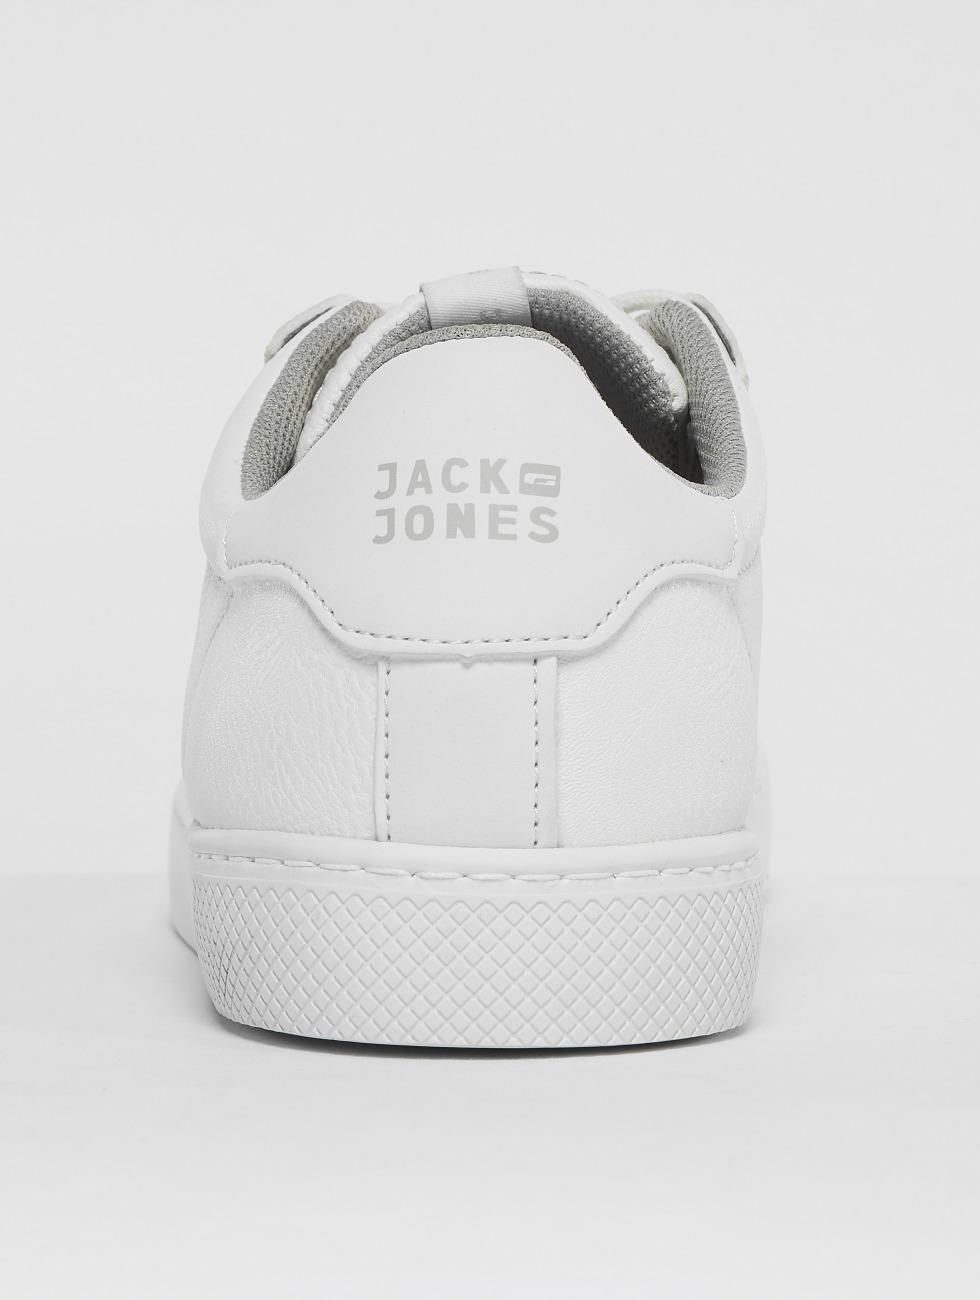 Jack & Jones schoen / sneaker jfw in wit 468475 Korting 2018 Gratis Verzending Snelle Levering Outlet Winkel Aanbod JxyJNDie